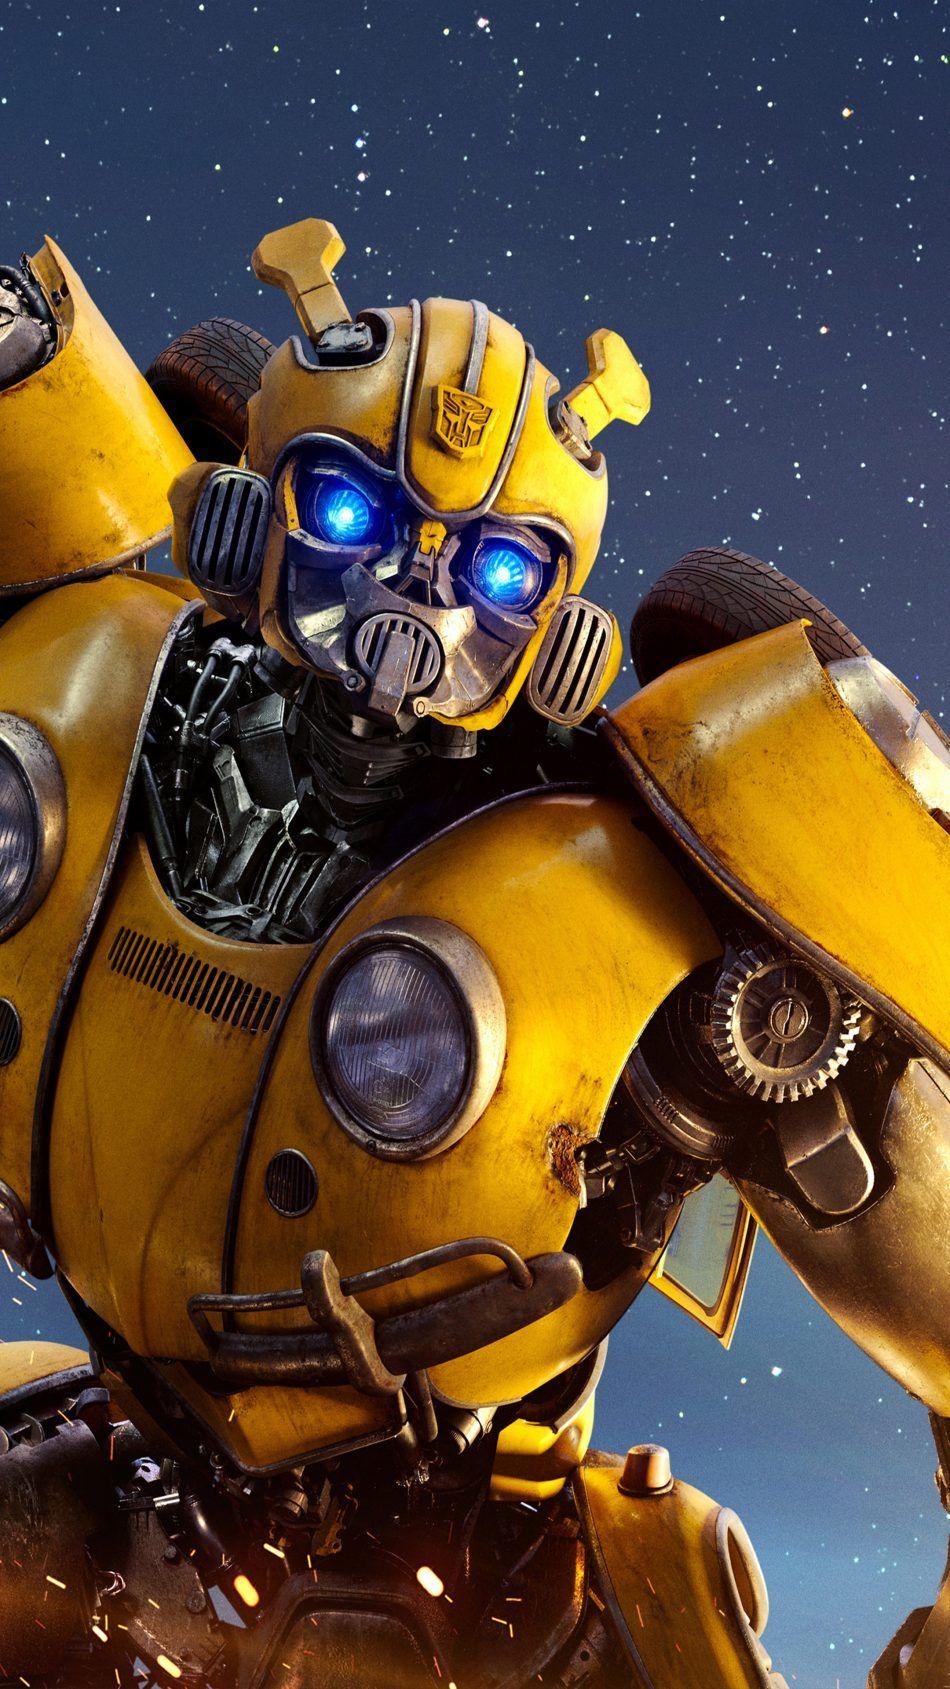 Bumblebee 2018 4k Ultra Hd Mobile Wallpaper Transformers Bumblebee Arte Transformers Transformers